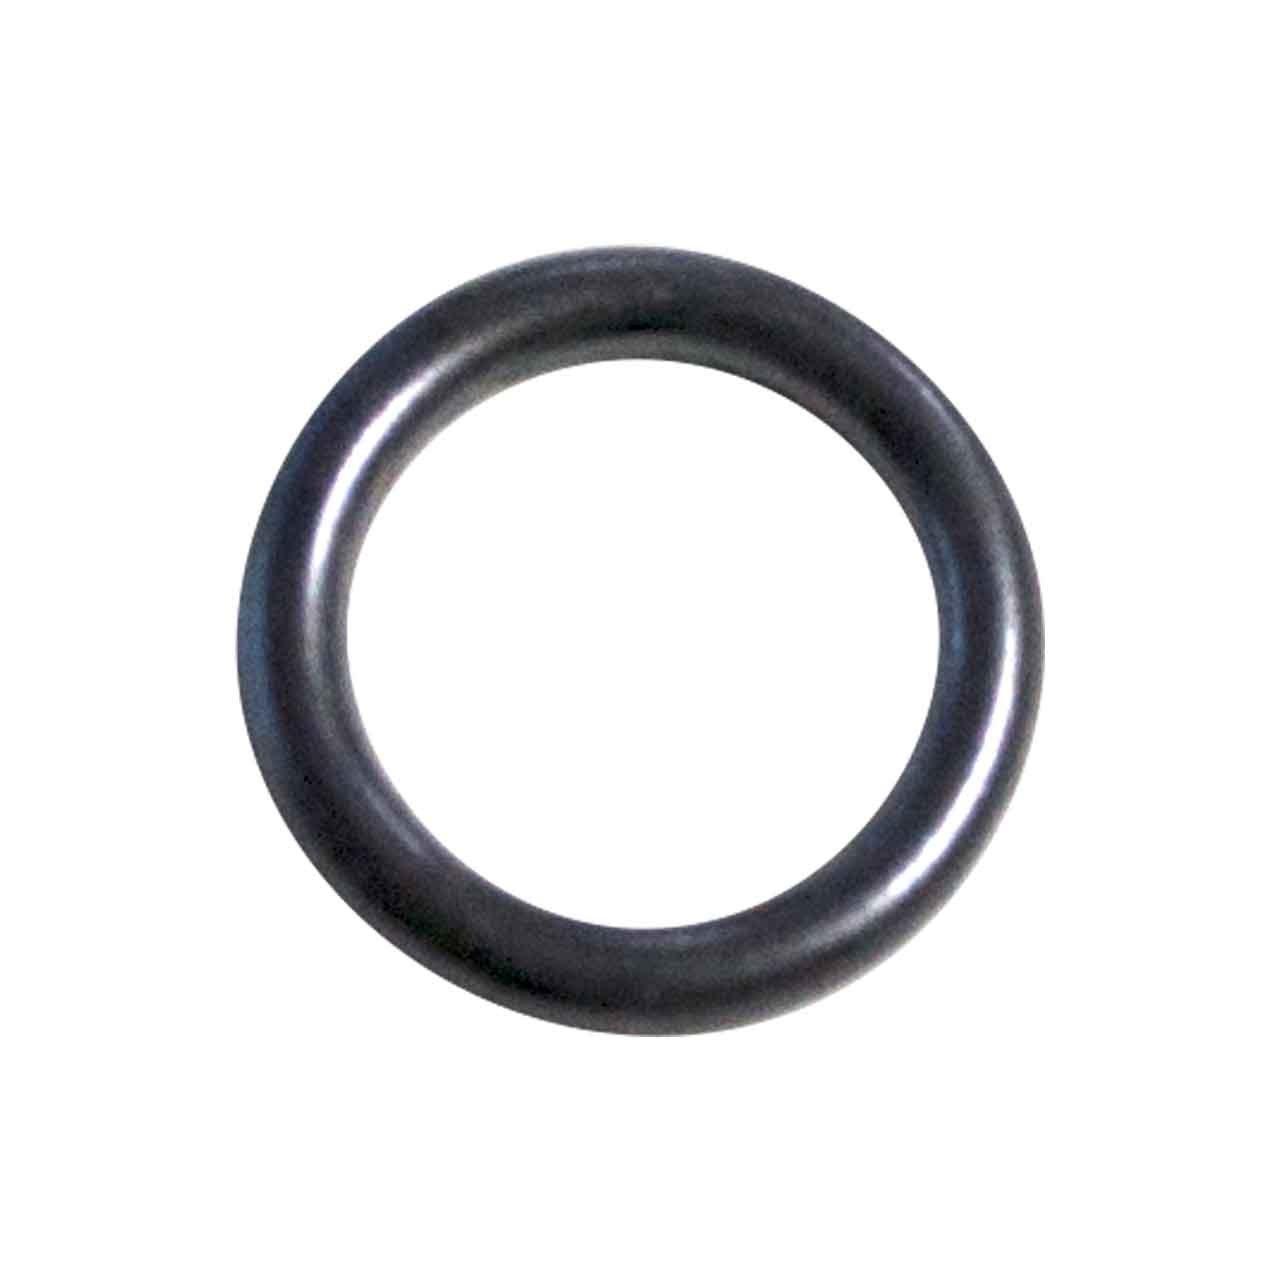 Miller Smith MW15 O-Ring Seal Rings Pkg Of 25 Medium Duty by Miller